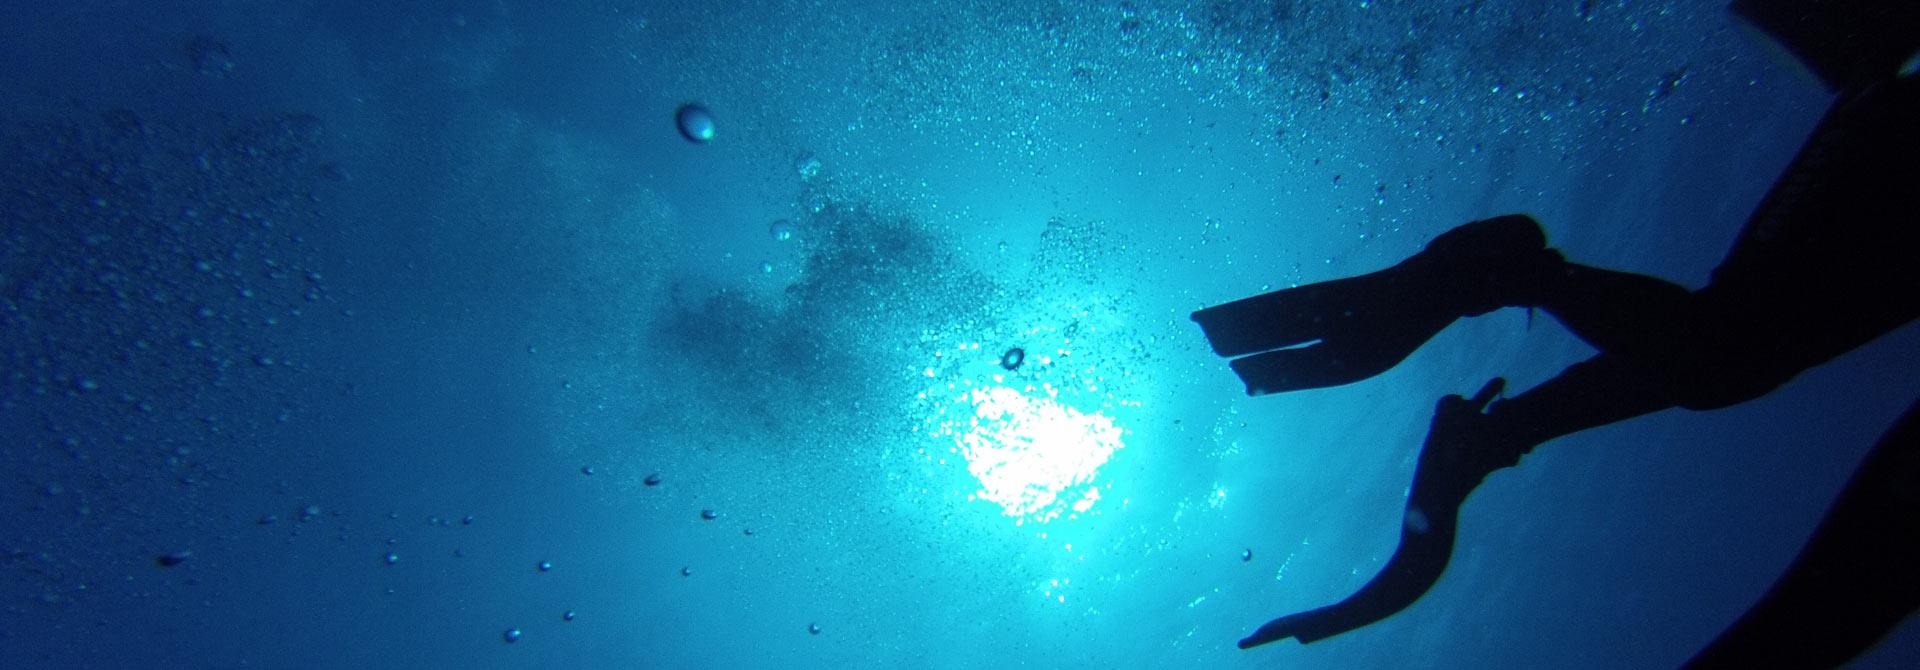 CNPS-web-imatge-submarinisme-inici8